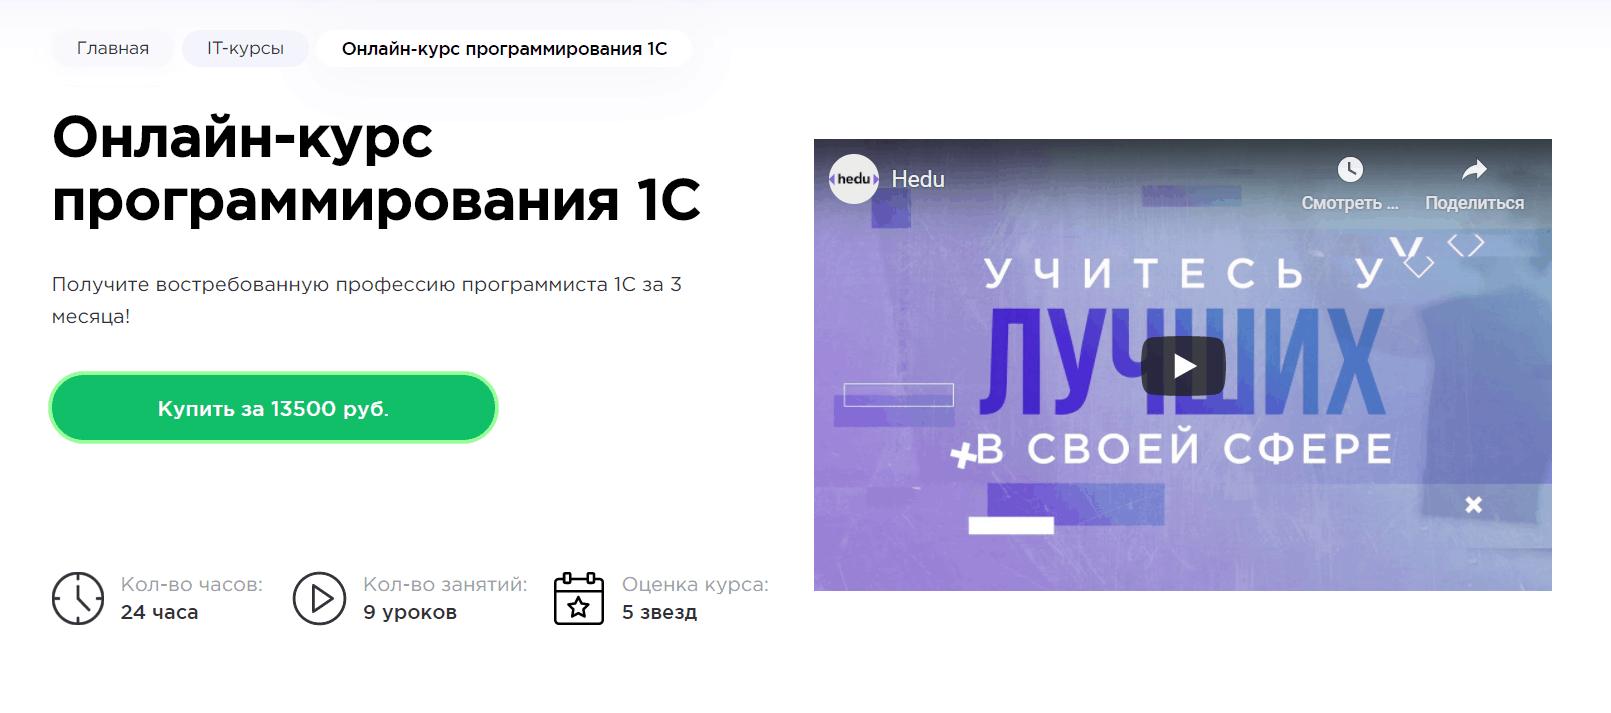 Онлайн-курс программирования 1C